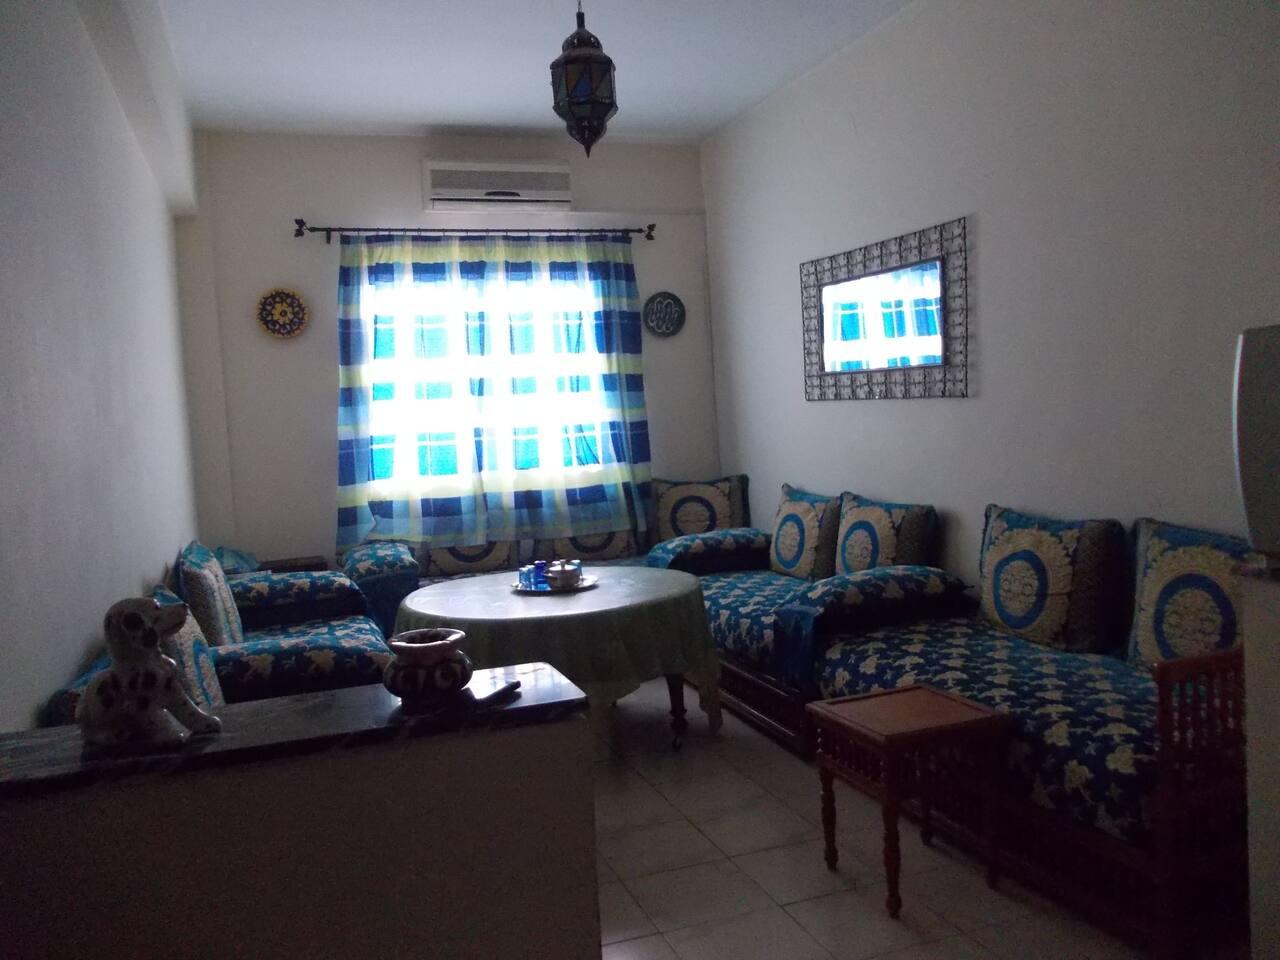 Salon traditionnel marocain,lumineux et spacieux